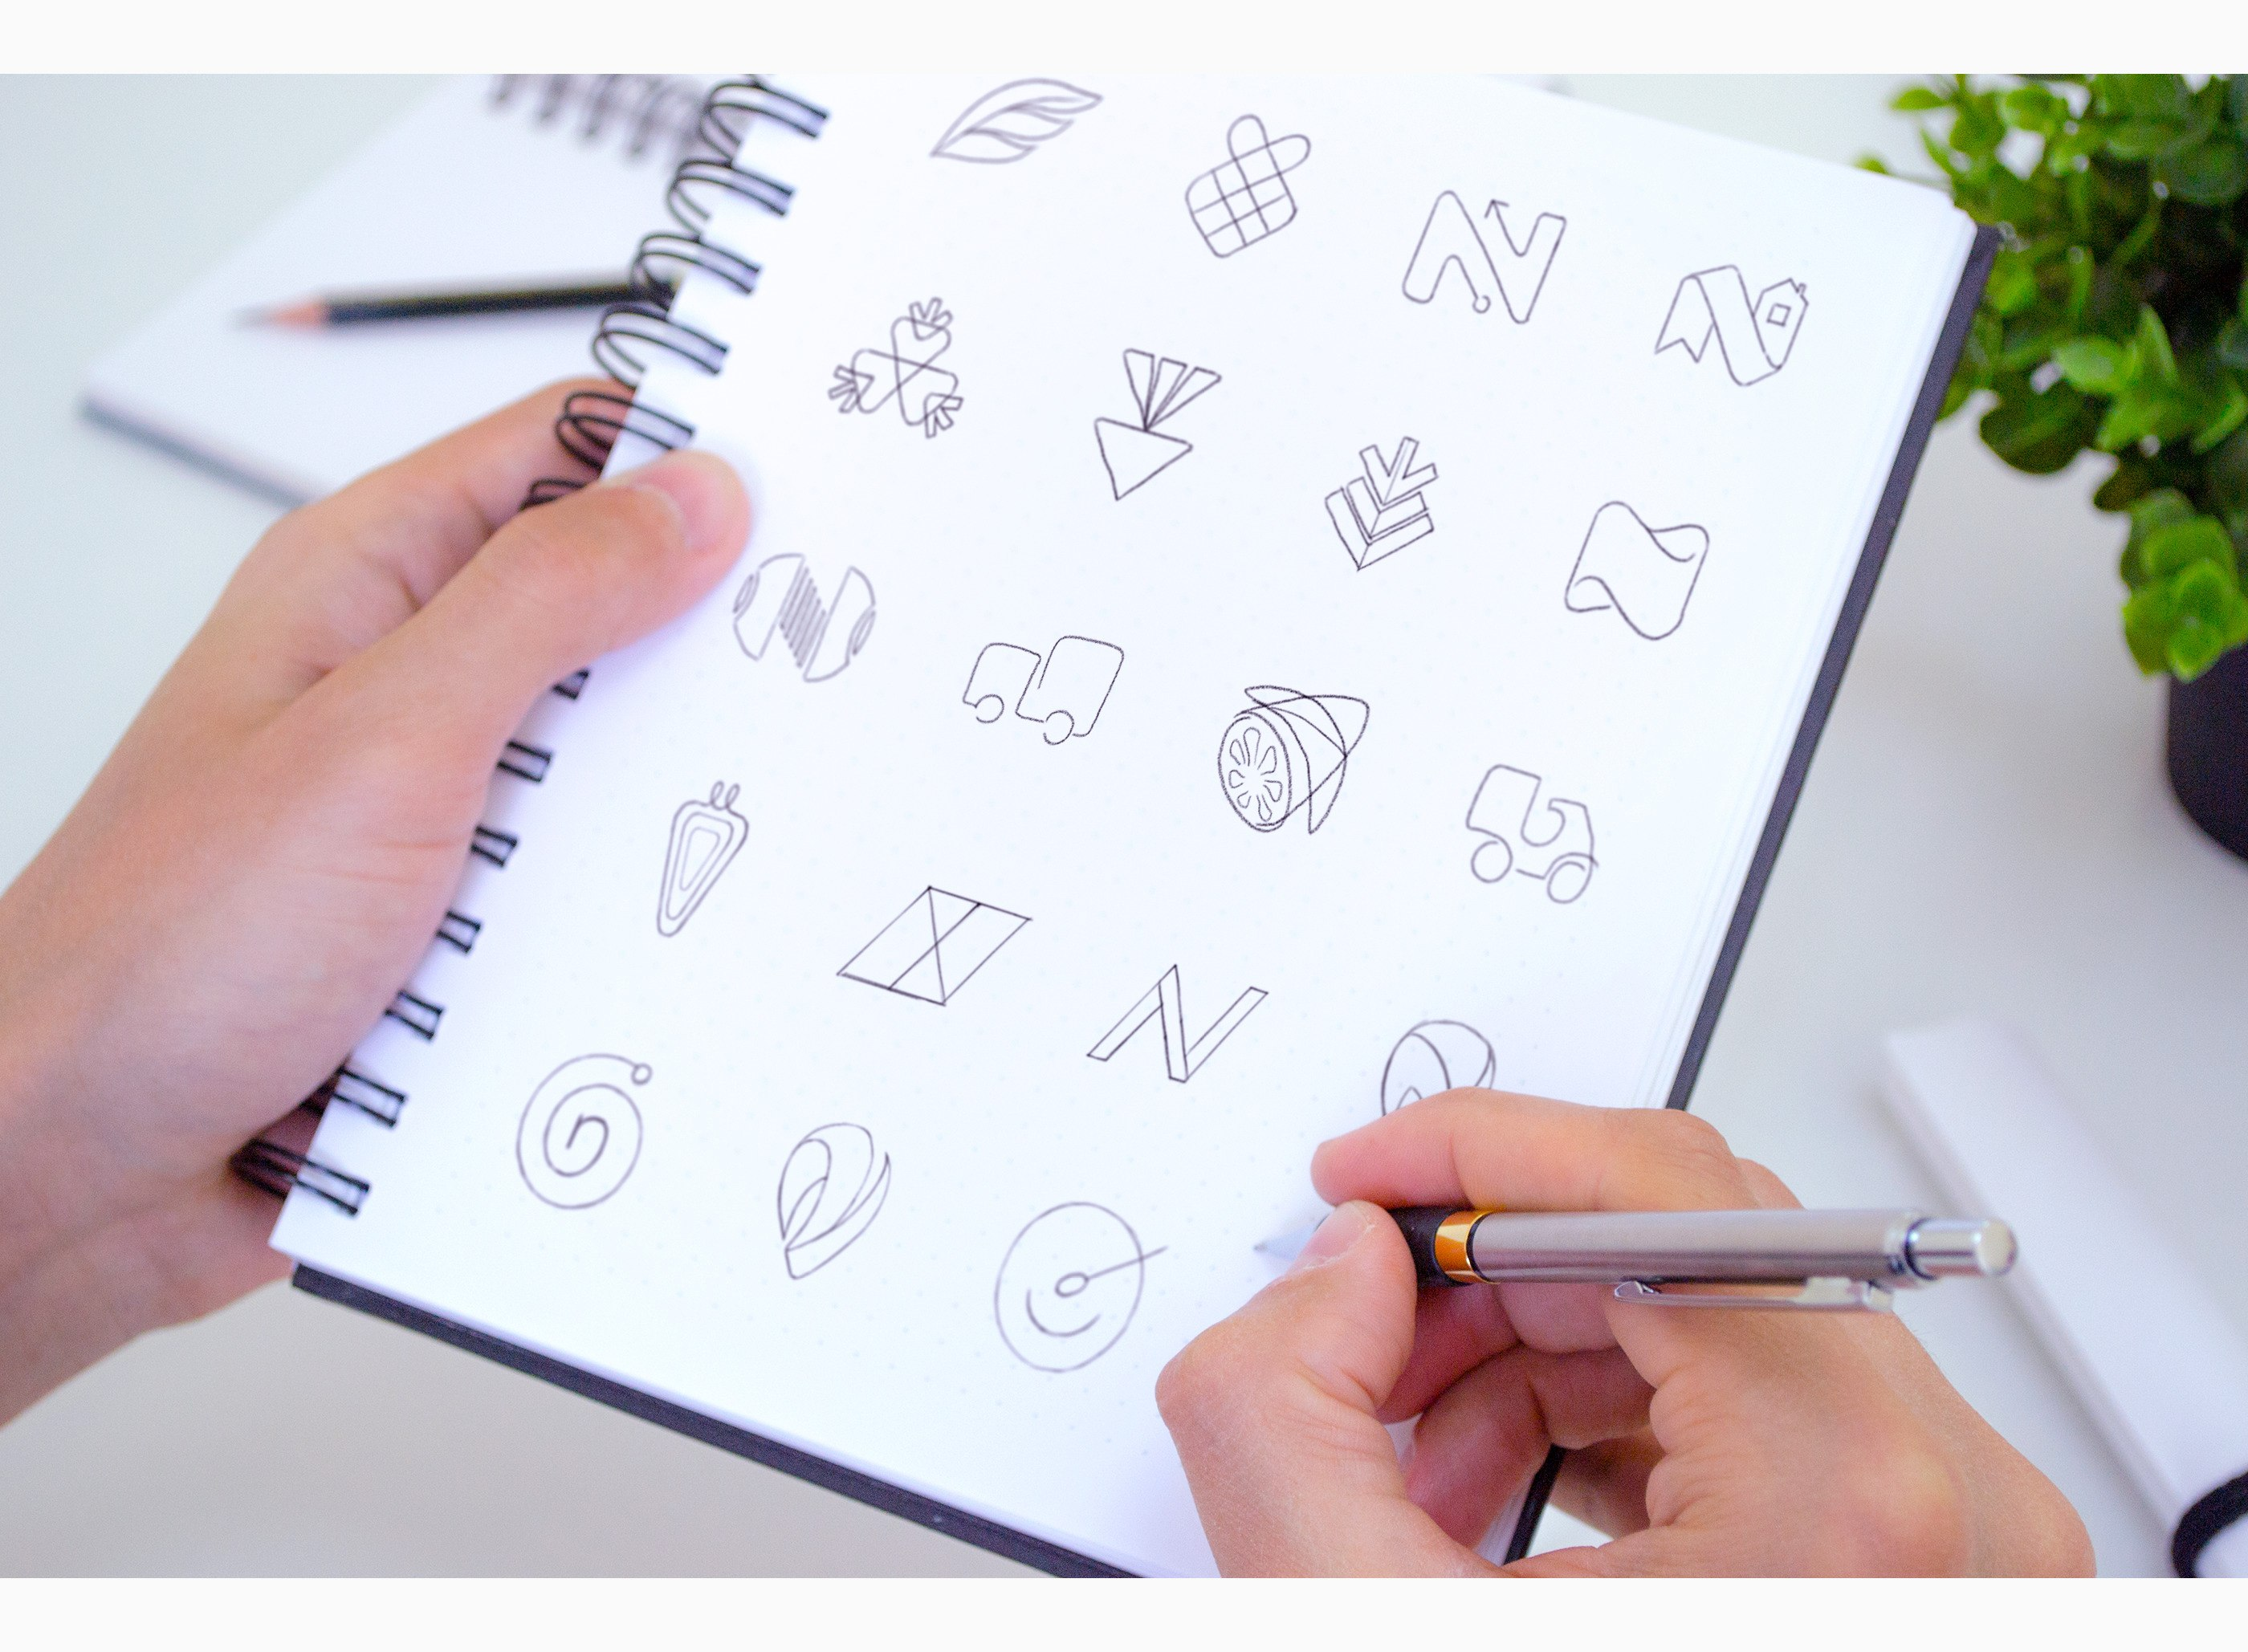 nelio sketches